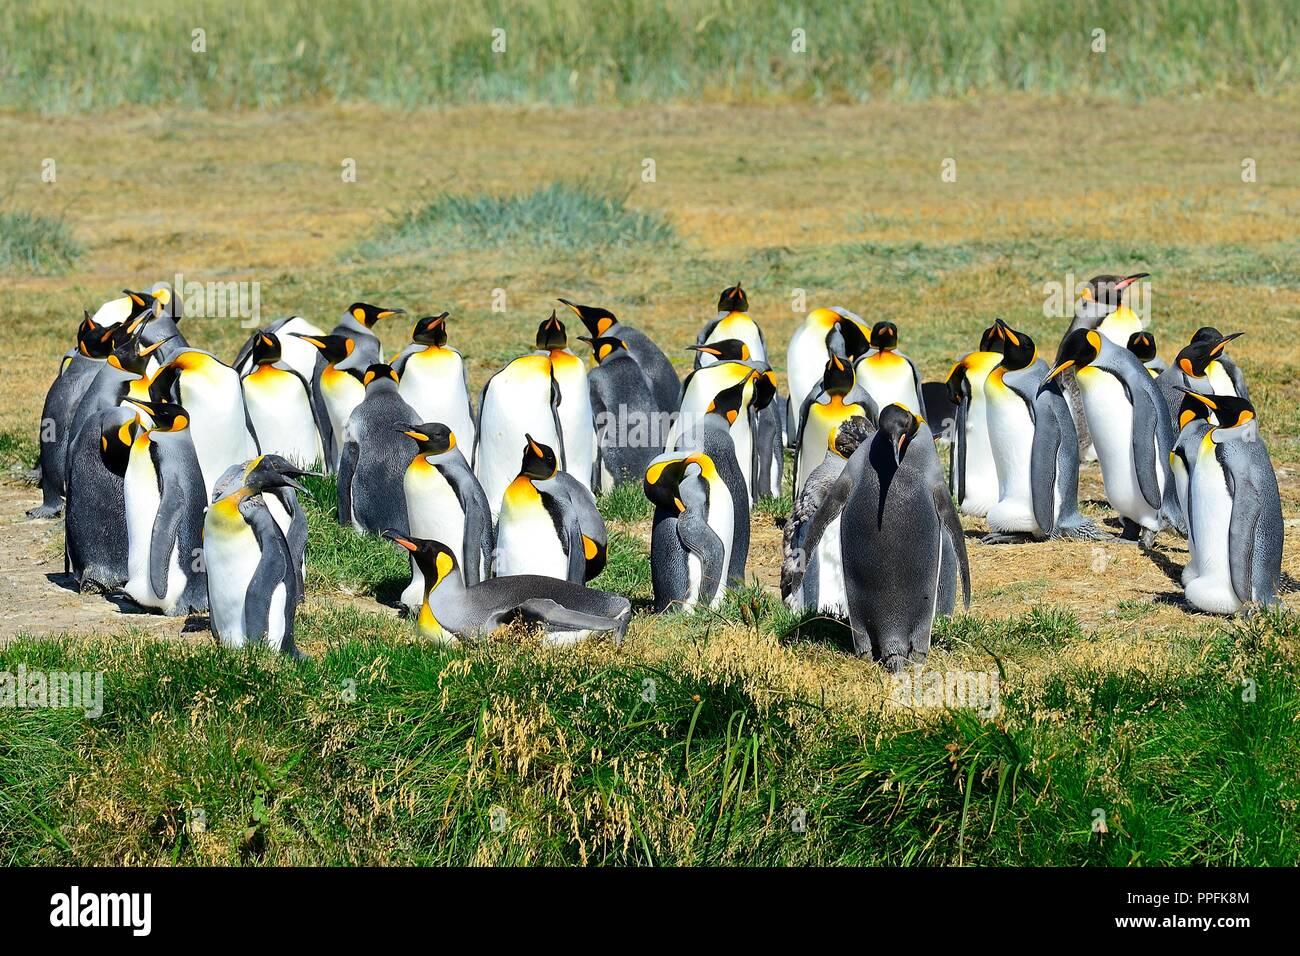 King penguins (Aptenodytes patagonicus), colony at Bahia Inutil, Parque Pingüino Rey, Porvenir, Province Tierra del Fuego - Stock Image